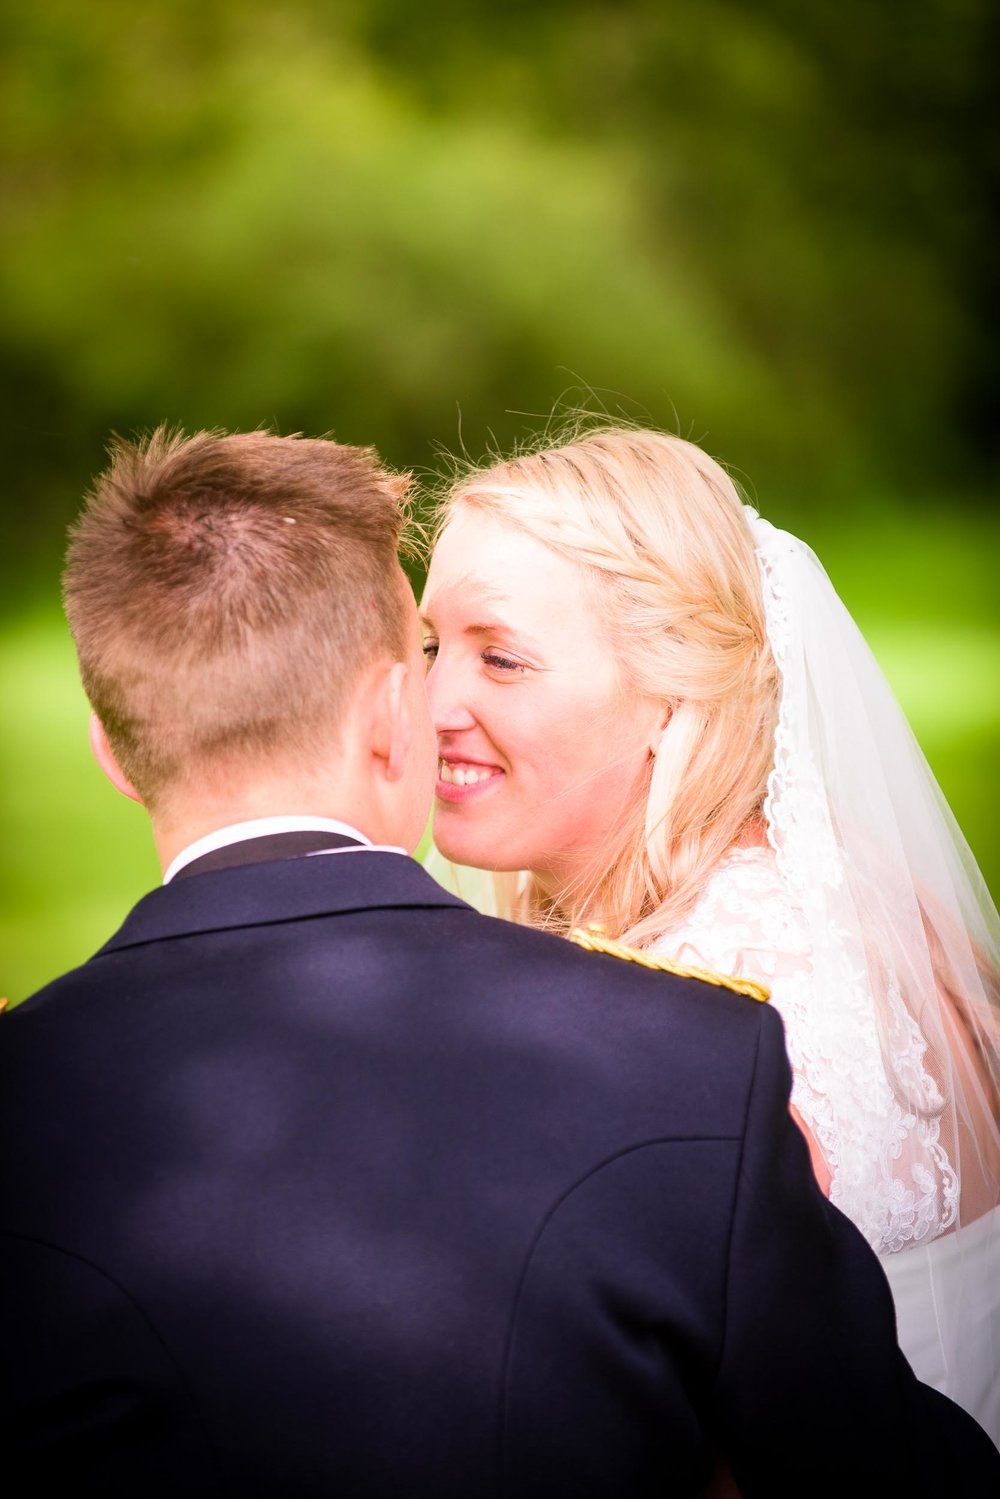 bröllopsfoto-Hässleholm-juli17-5.jpg